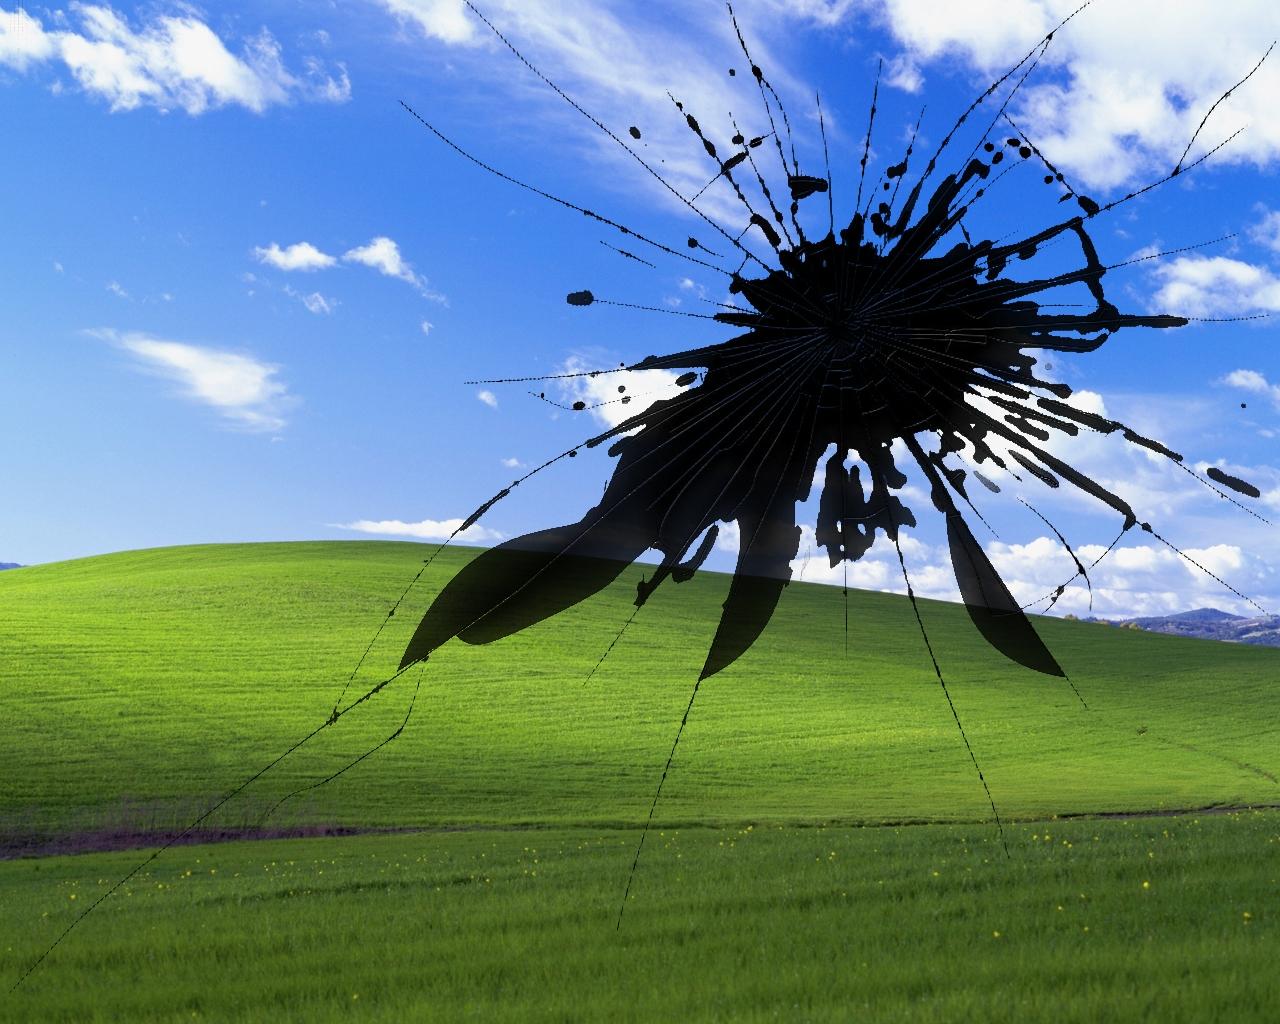 Soft Broken Windows Xp Screen Bliss Wallpaper Is Suitable wallpaper 1280x1024